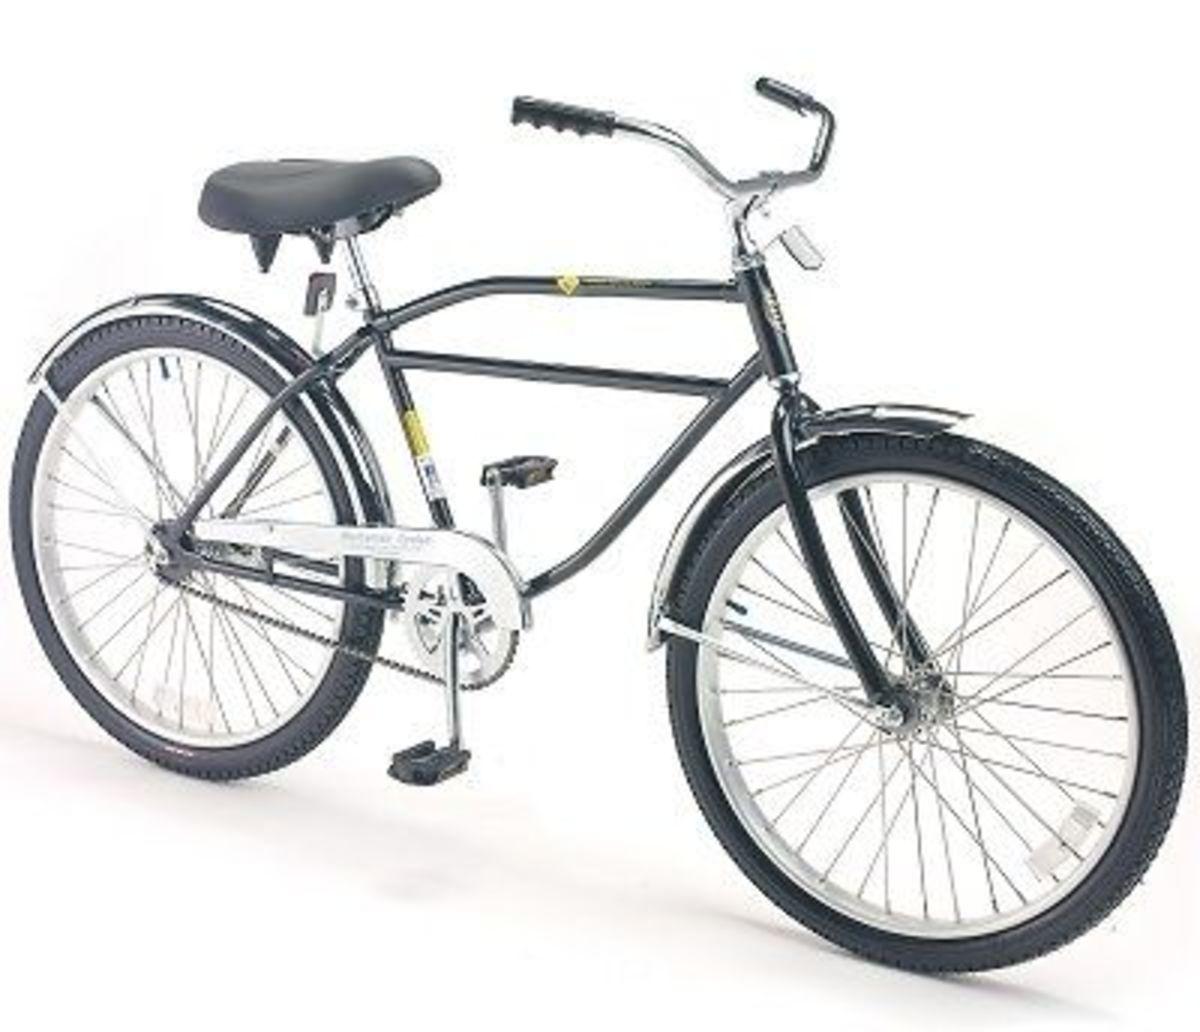 Workman Industrial Bicycle